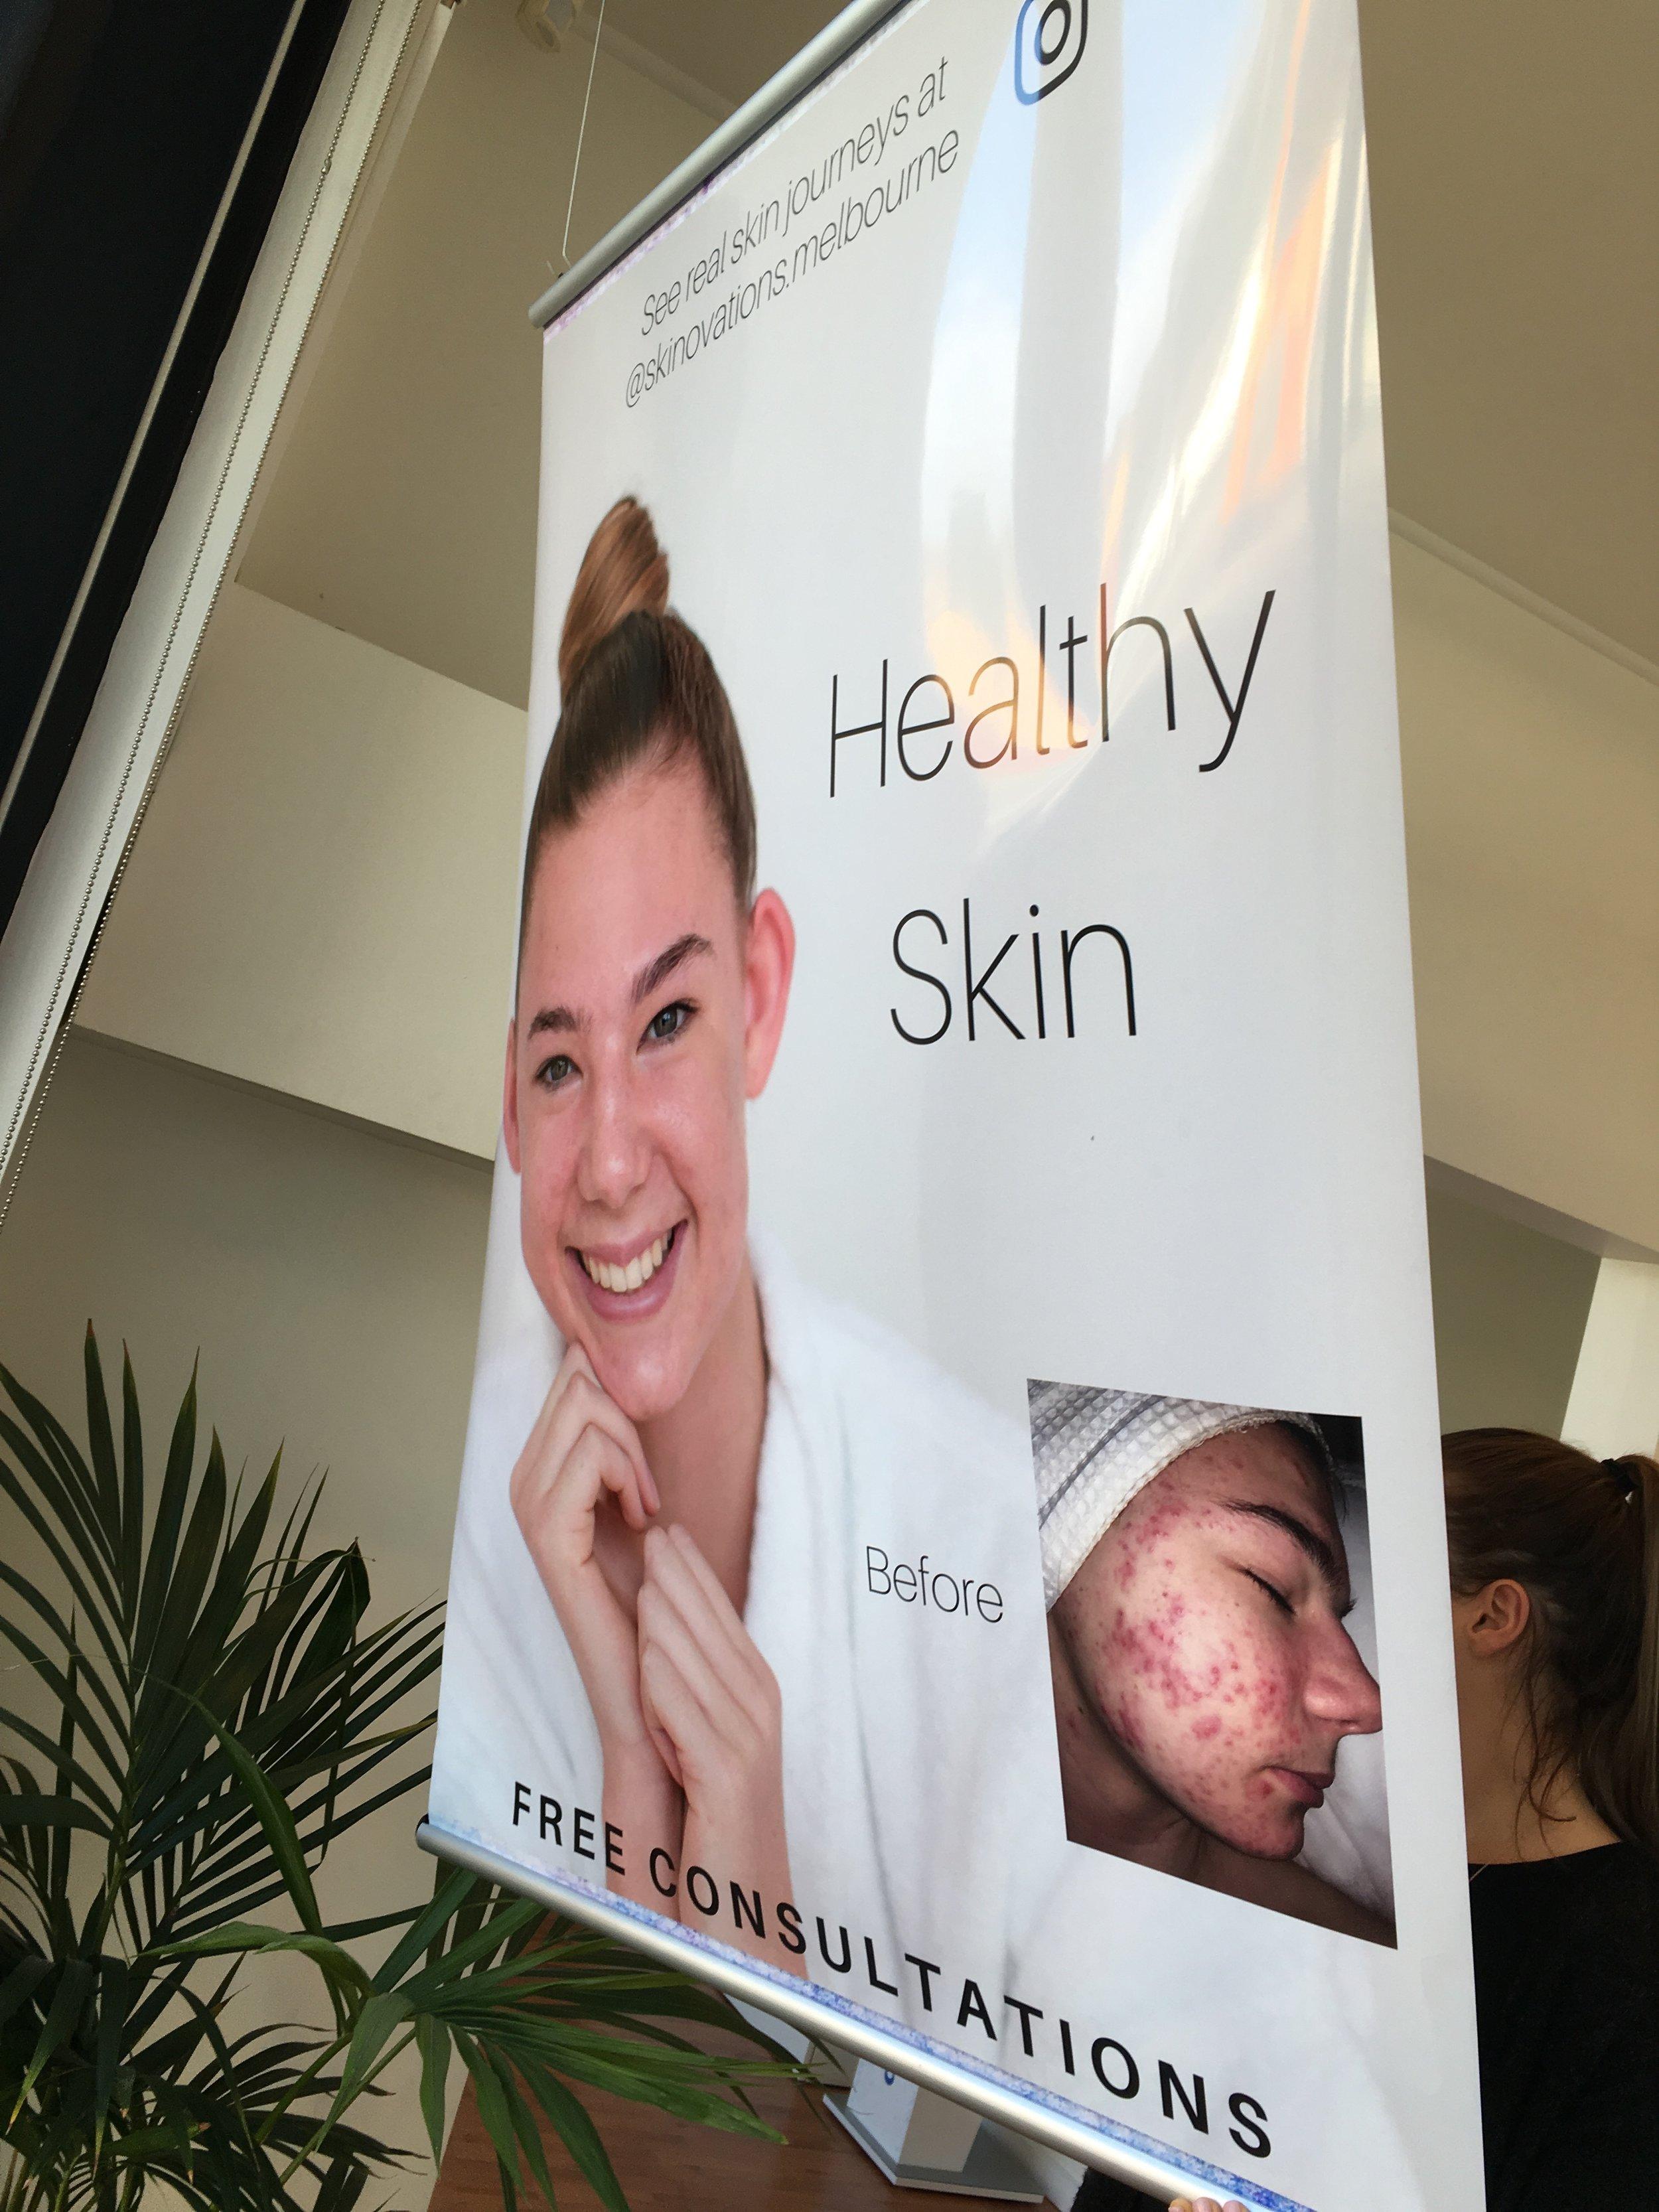 Skin health clinic Melbourne acne, rosacea, dmk enzyme therapy melbourne dmk enzyme treatment melbourne